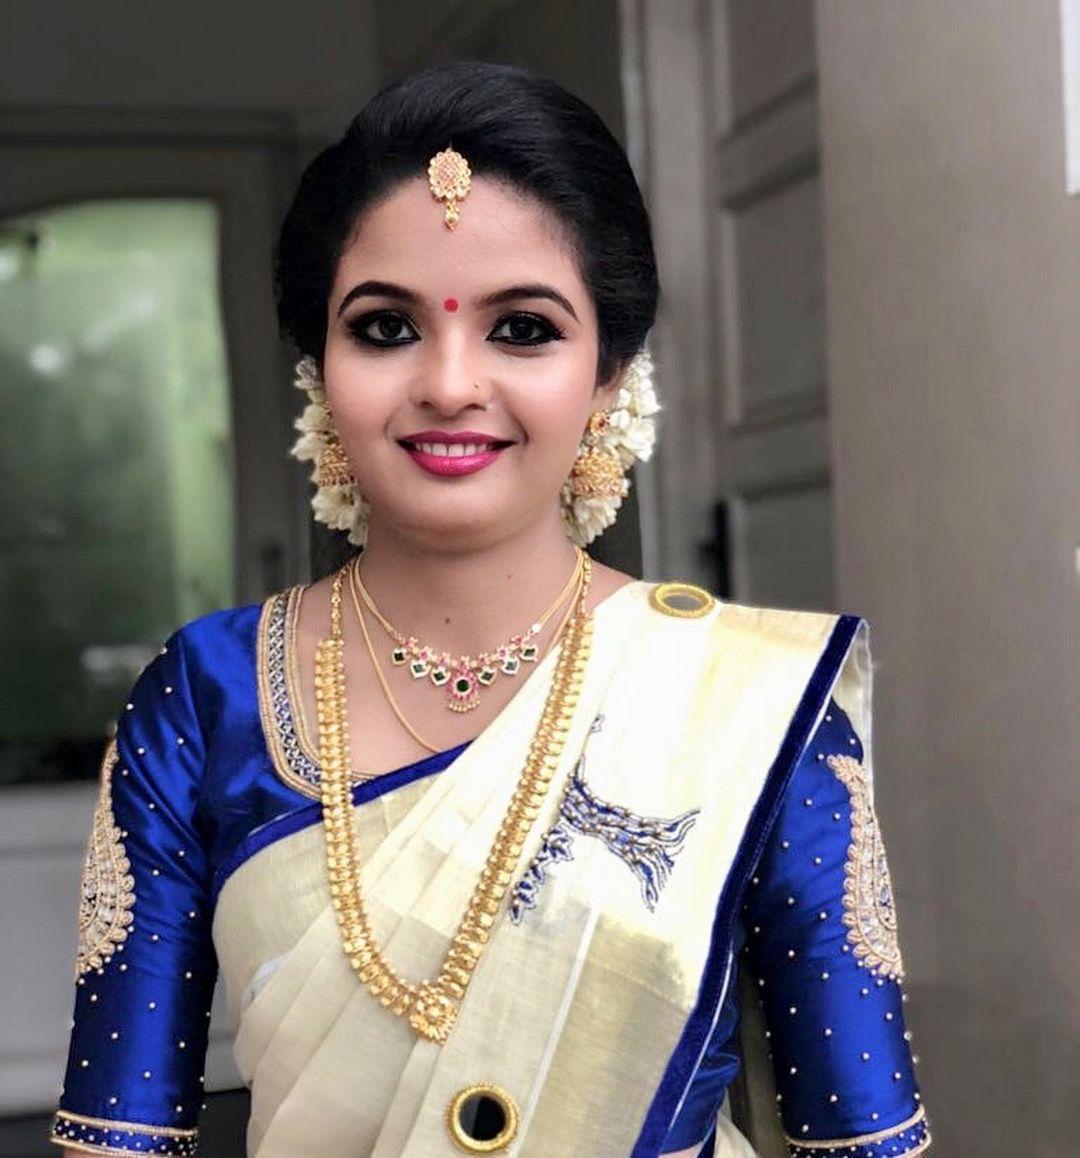 Dr Aiswariya Harikumar Makeup For The Marriage Ceremony Of Tying The Ritual Thread Thaali I Saree Hairstyles Kerala Saree Blouse Designs Kerala Saree Blouse